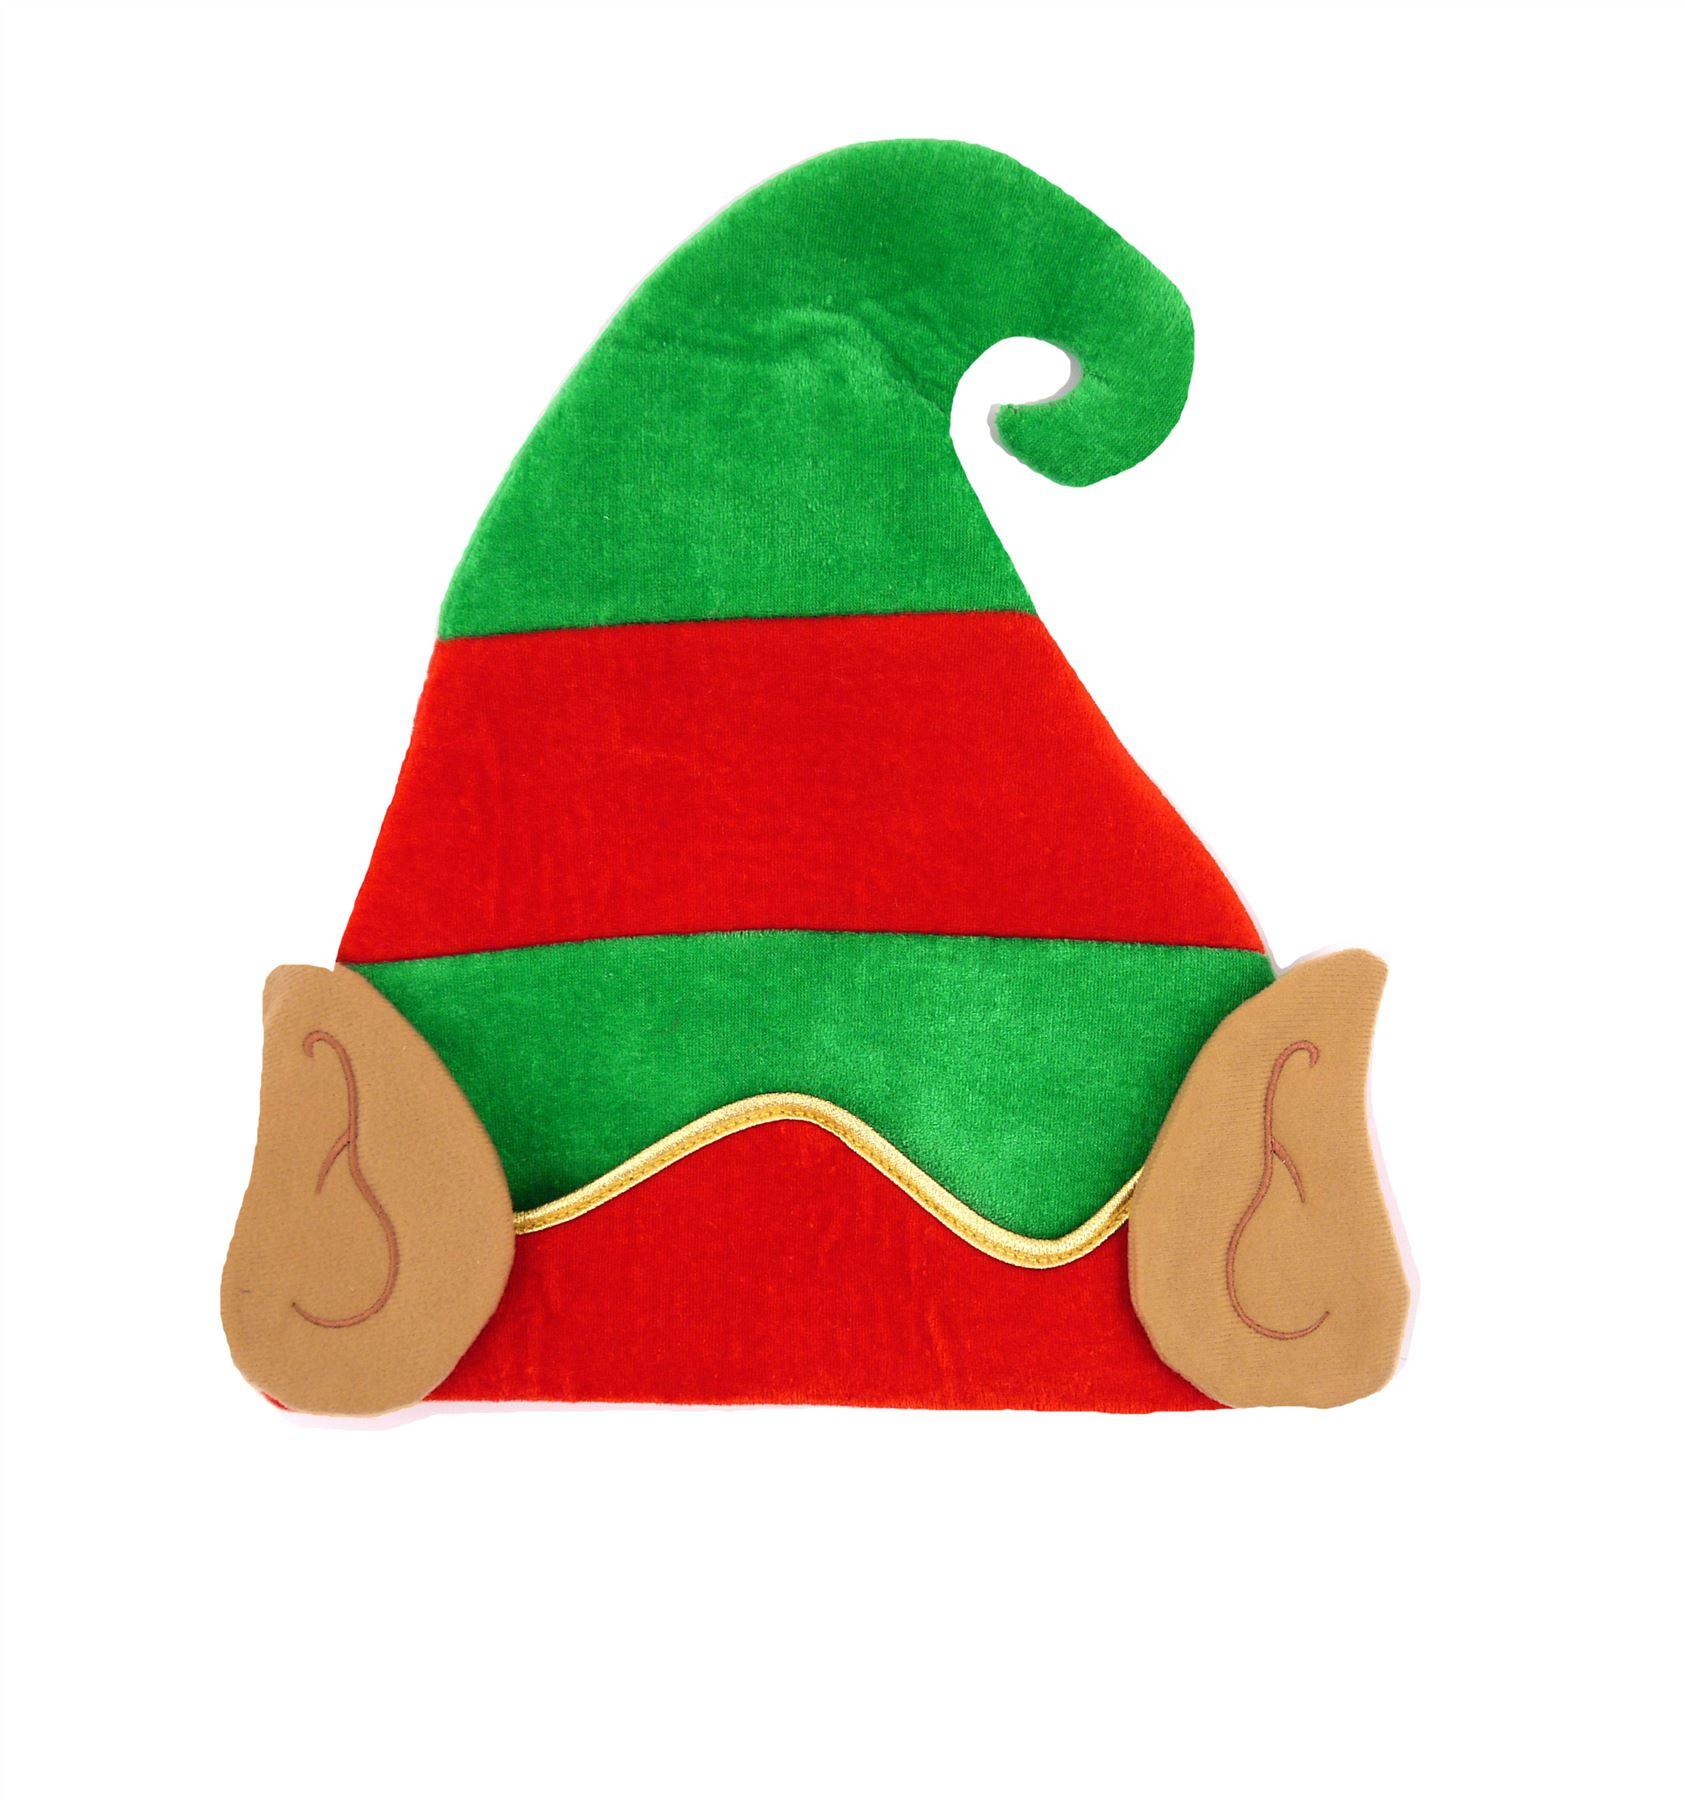 Christmas hat secret elf santa claus reindeer rudolph